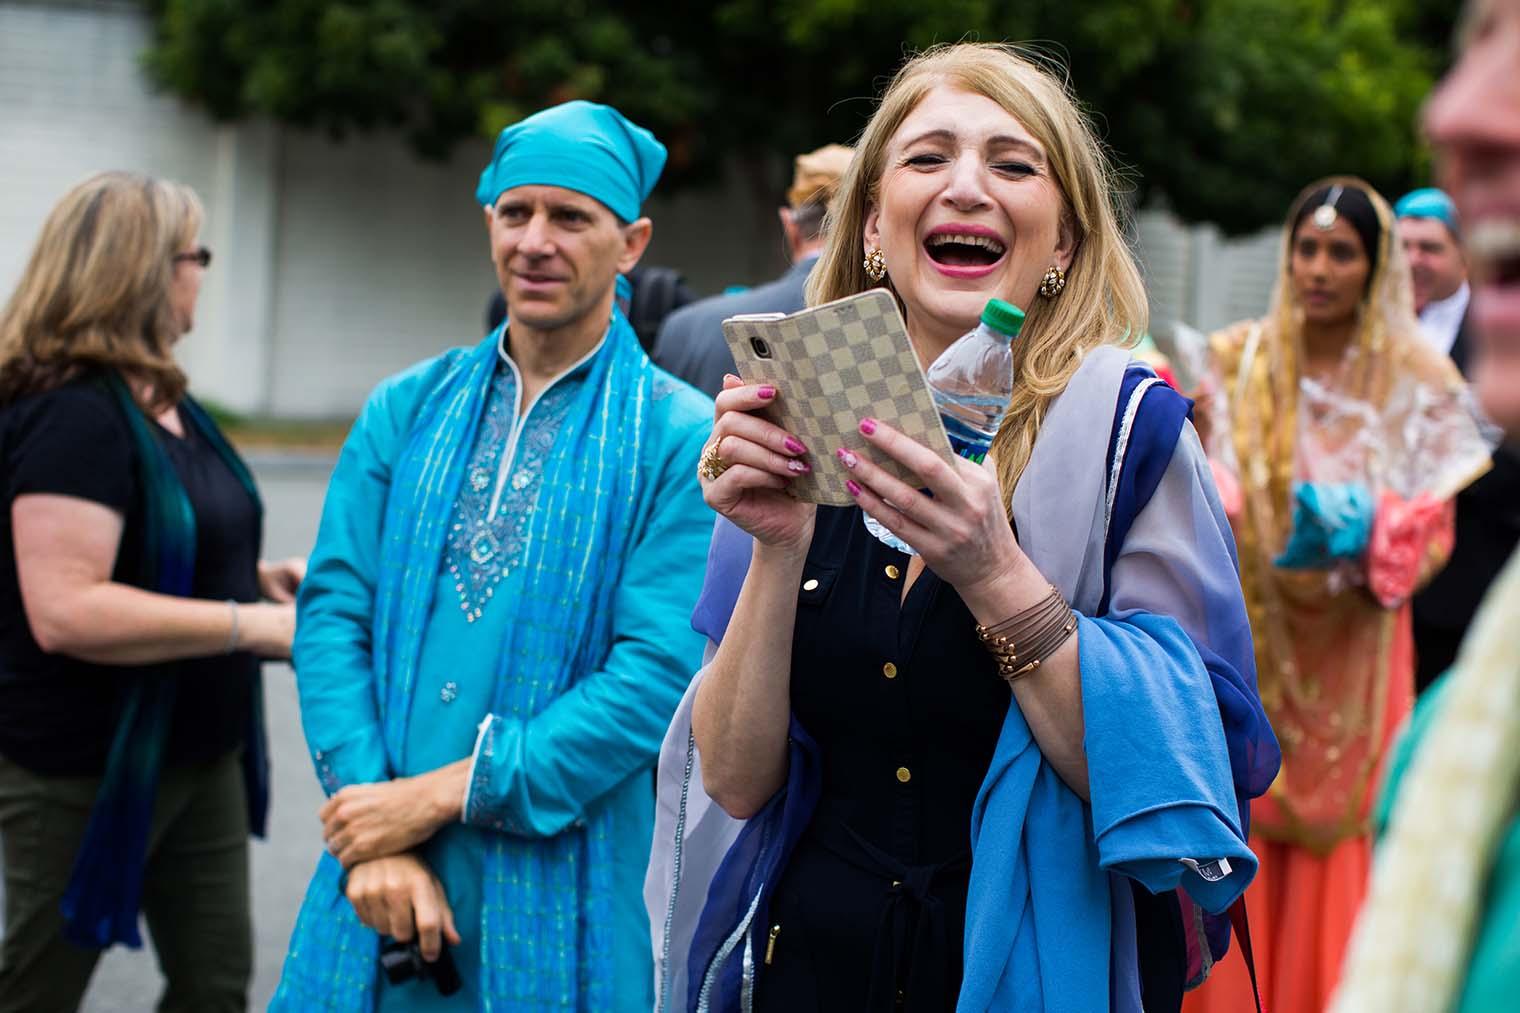 Candid Wedding Moments at Gurdwara Sahib of Fremont